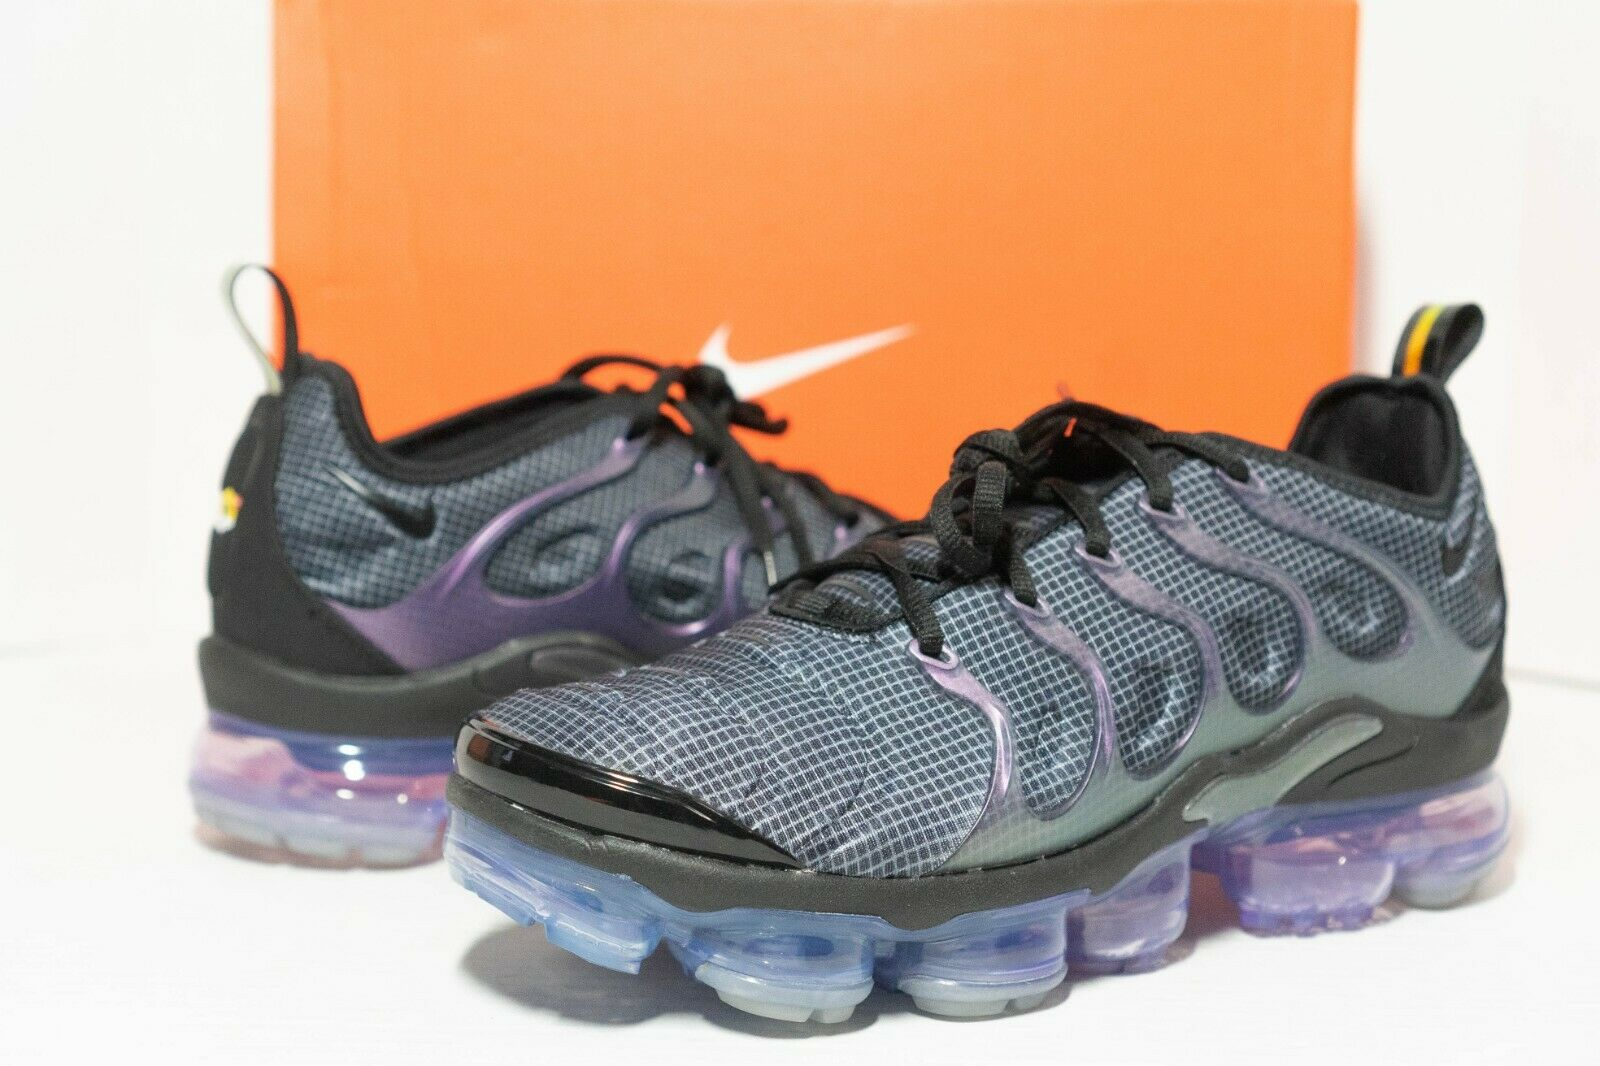 Size 9.5 - Nike Air VaporMax Plus